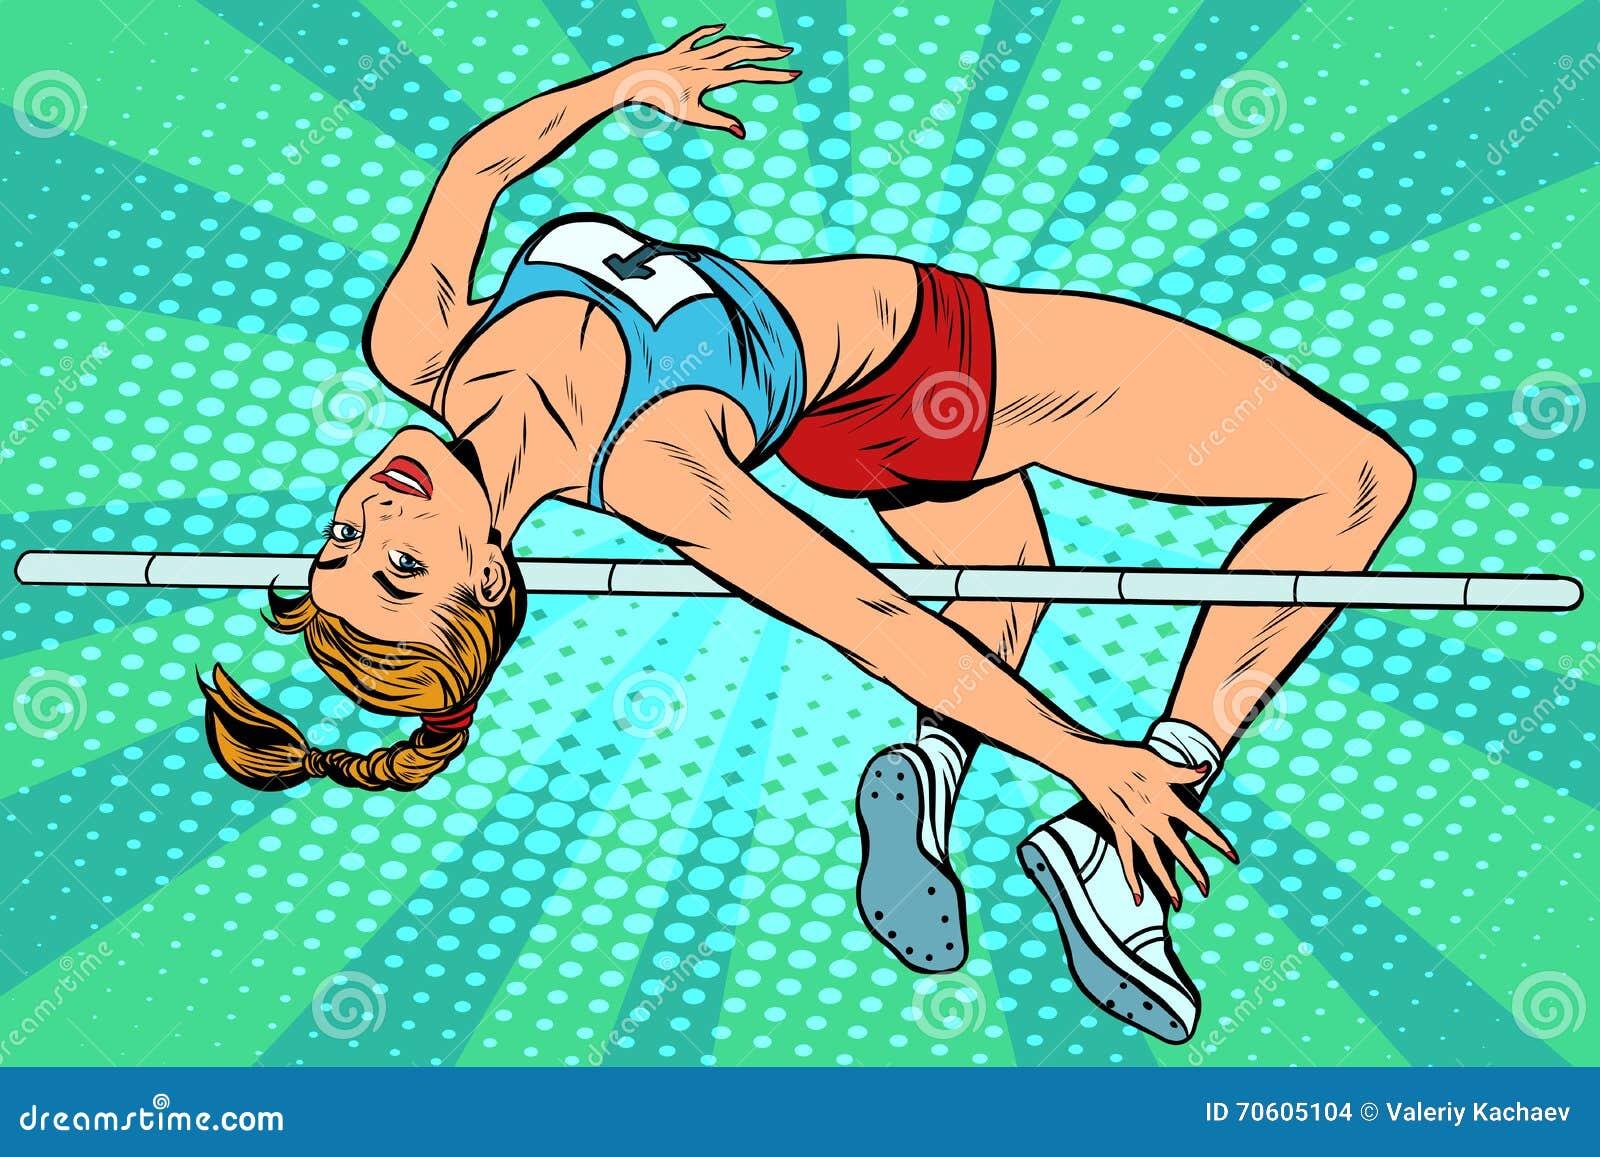 Athlete high jump girl